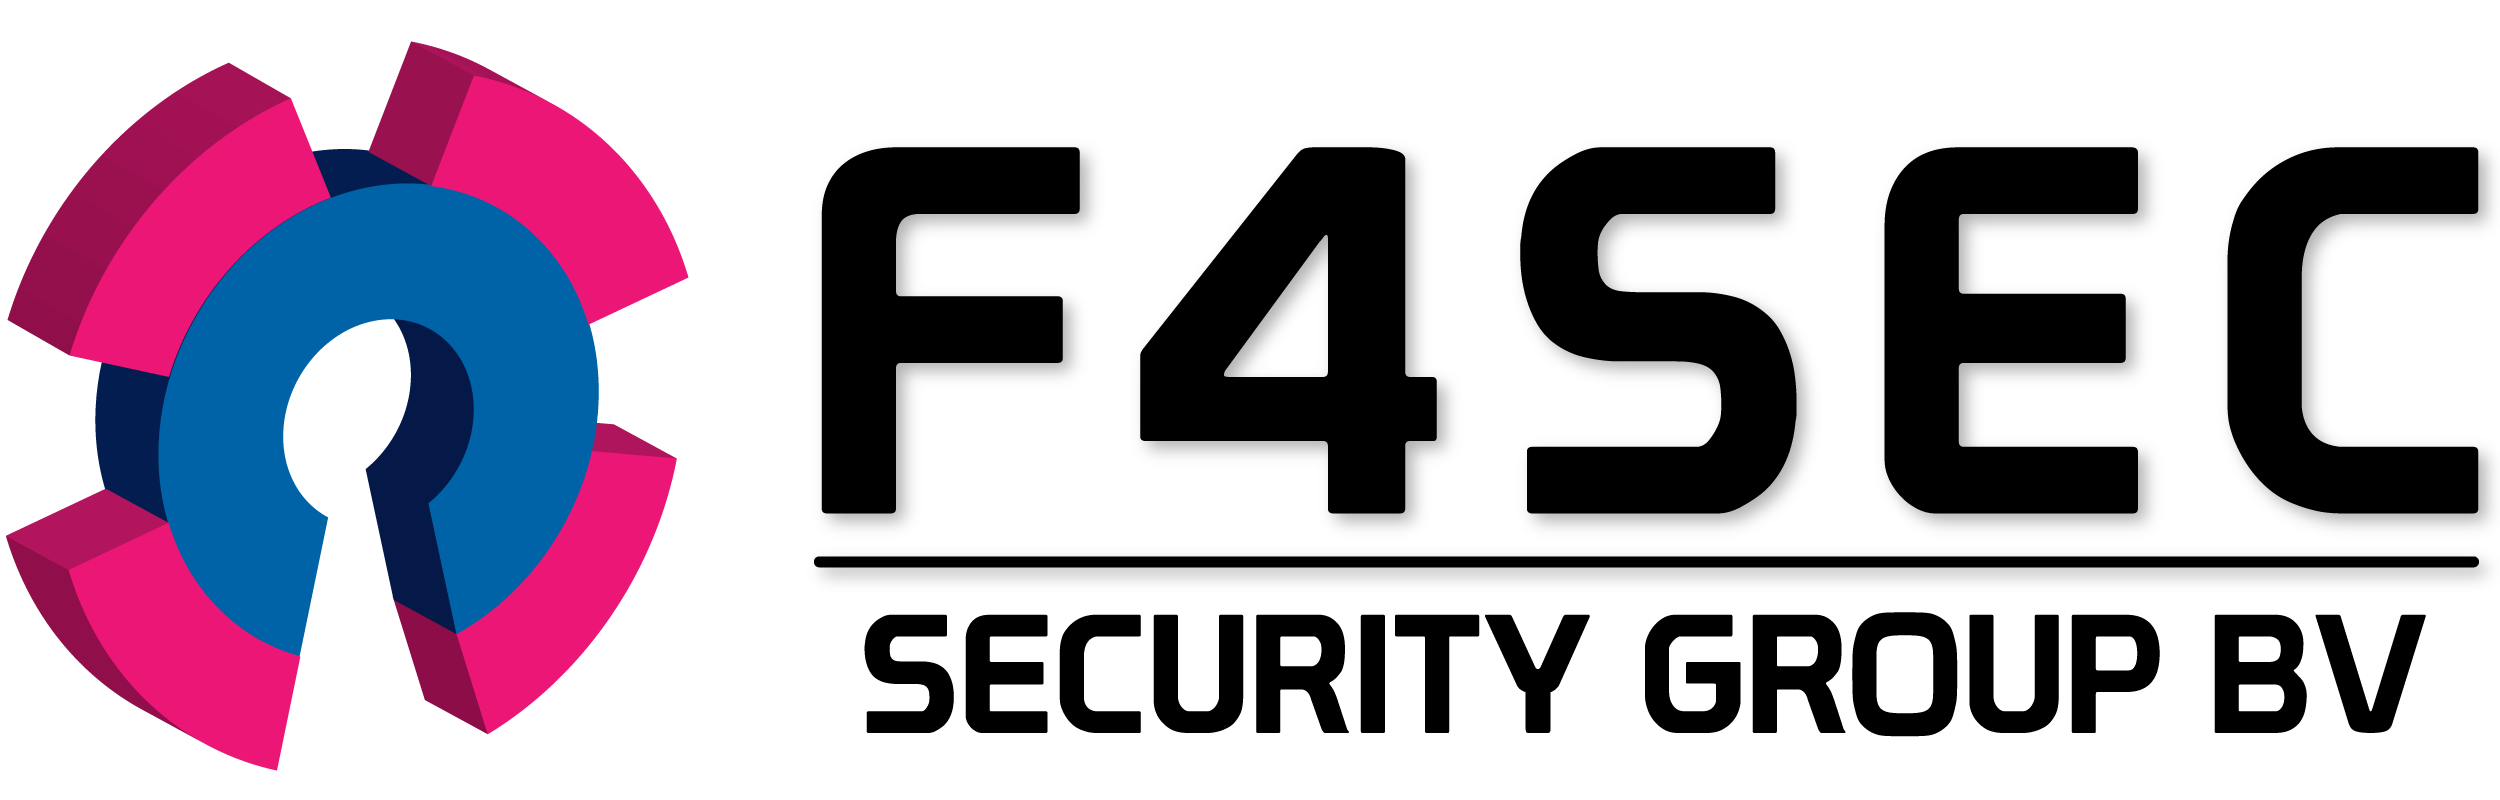 F4SEC